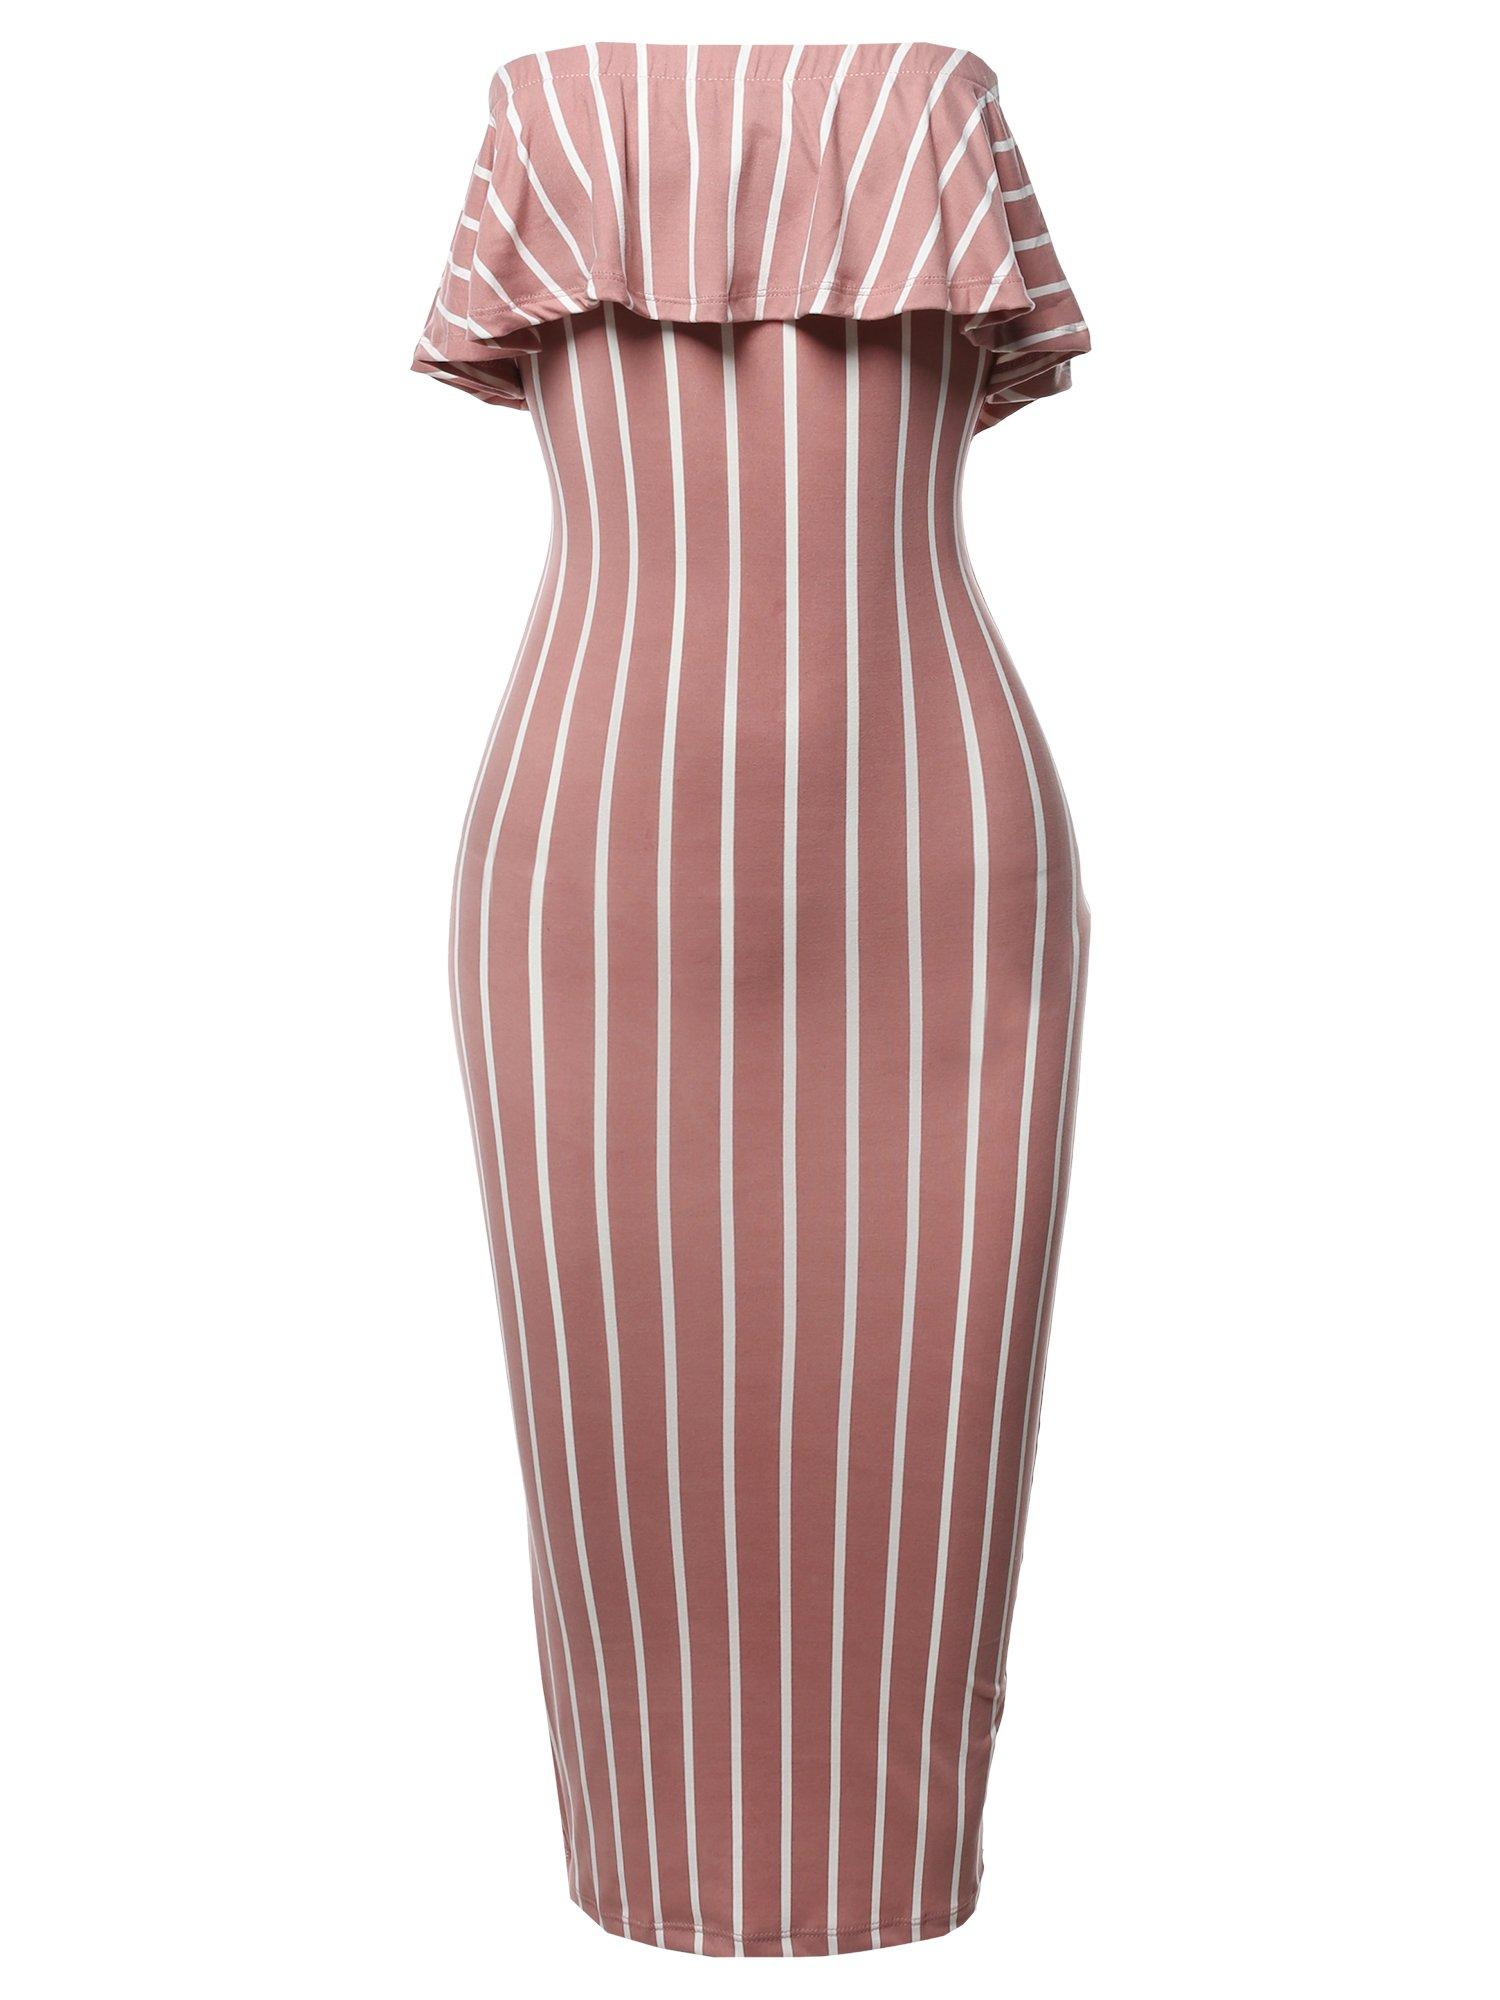 Slim Fit Off-Shoulder Pinstriped Crepe Tube Midi Dress Mauve L